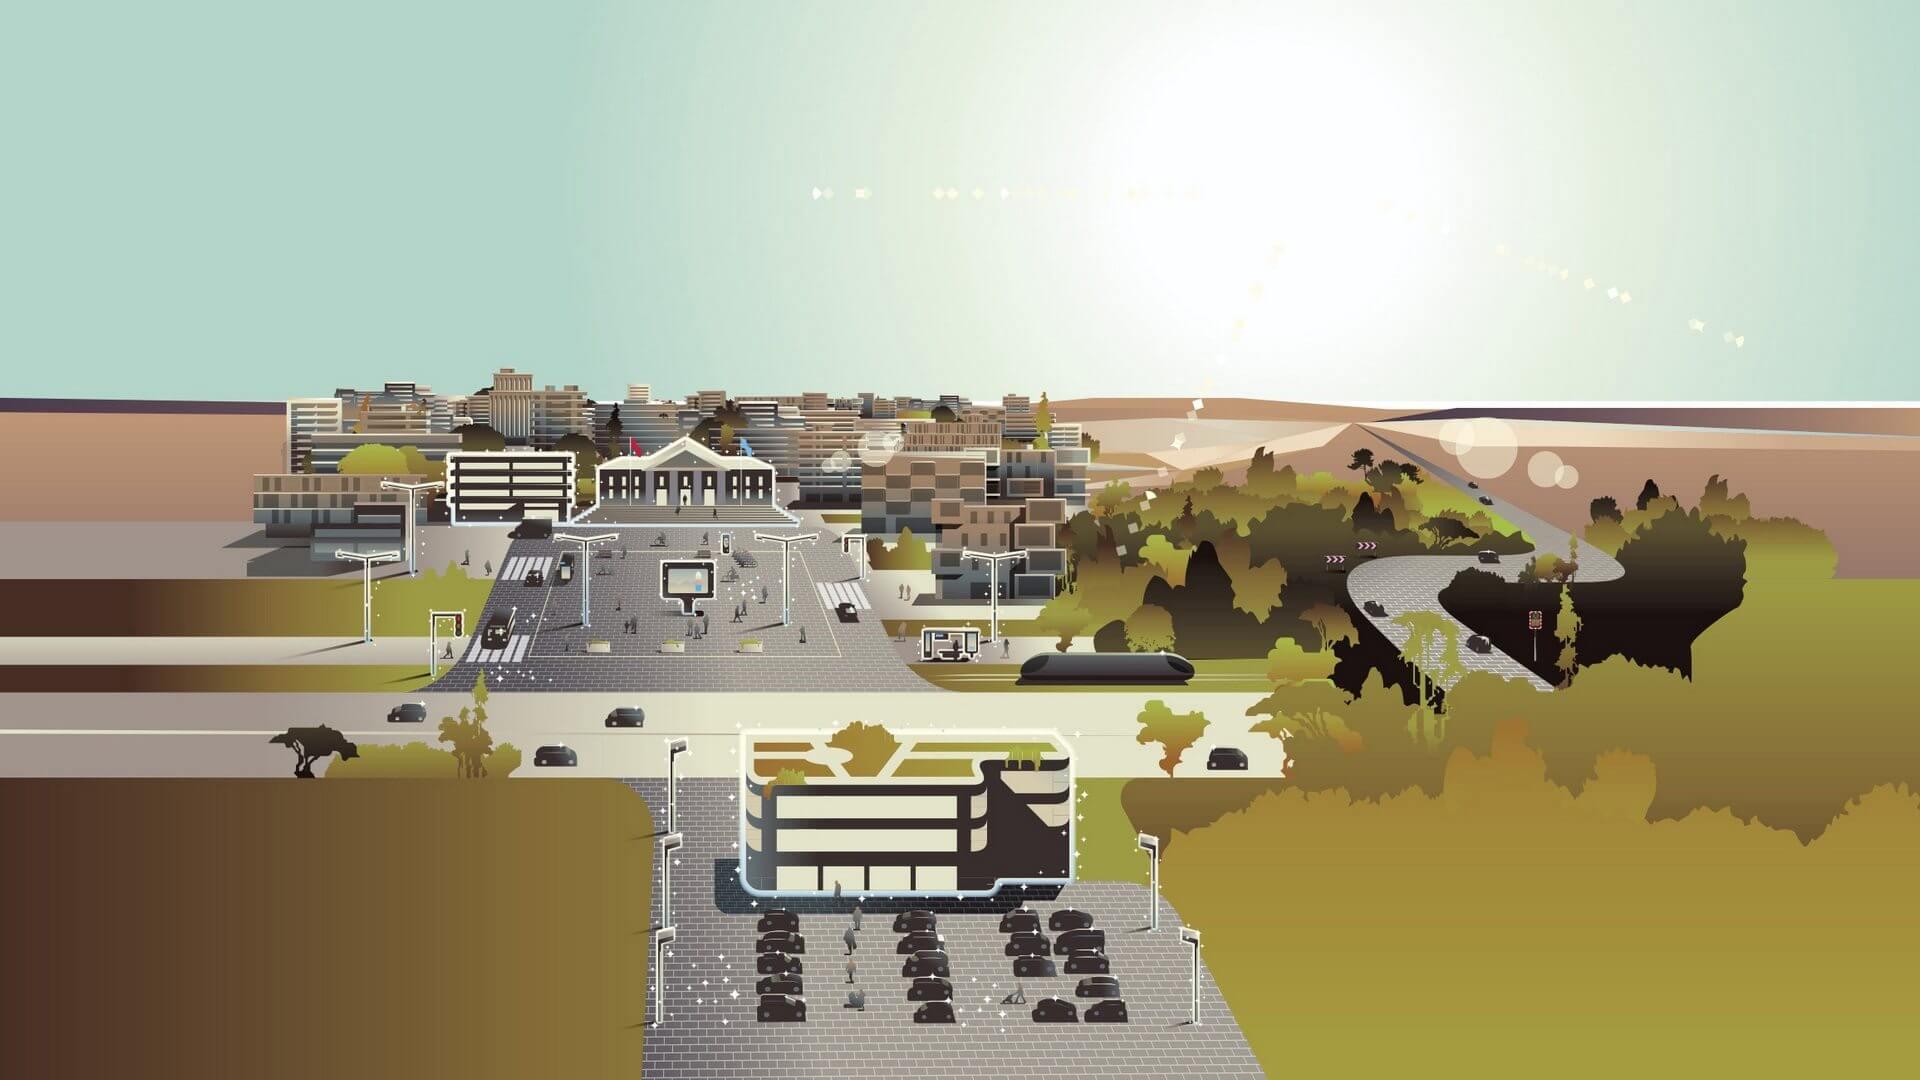 smt Wattway P0 - Nova tecnologia transforma ruas em painéis de energia solar